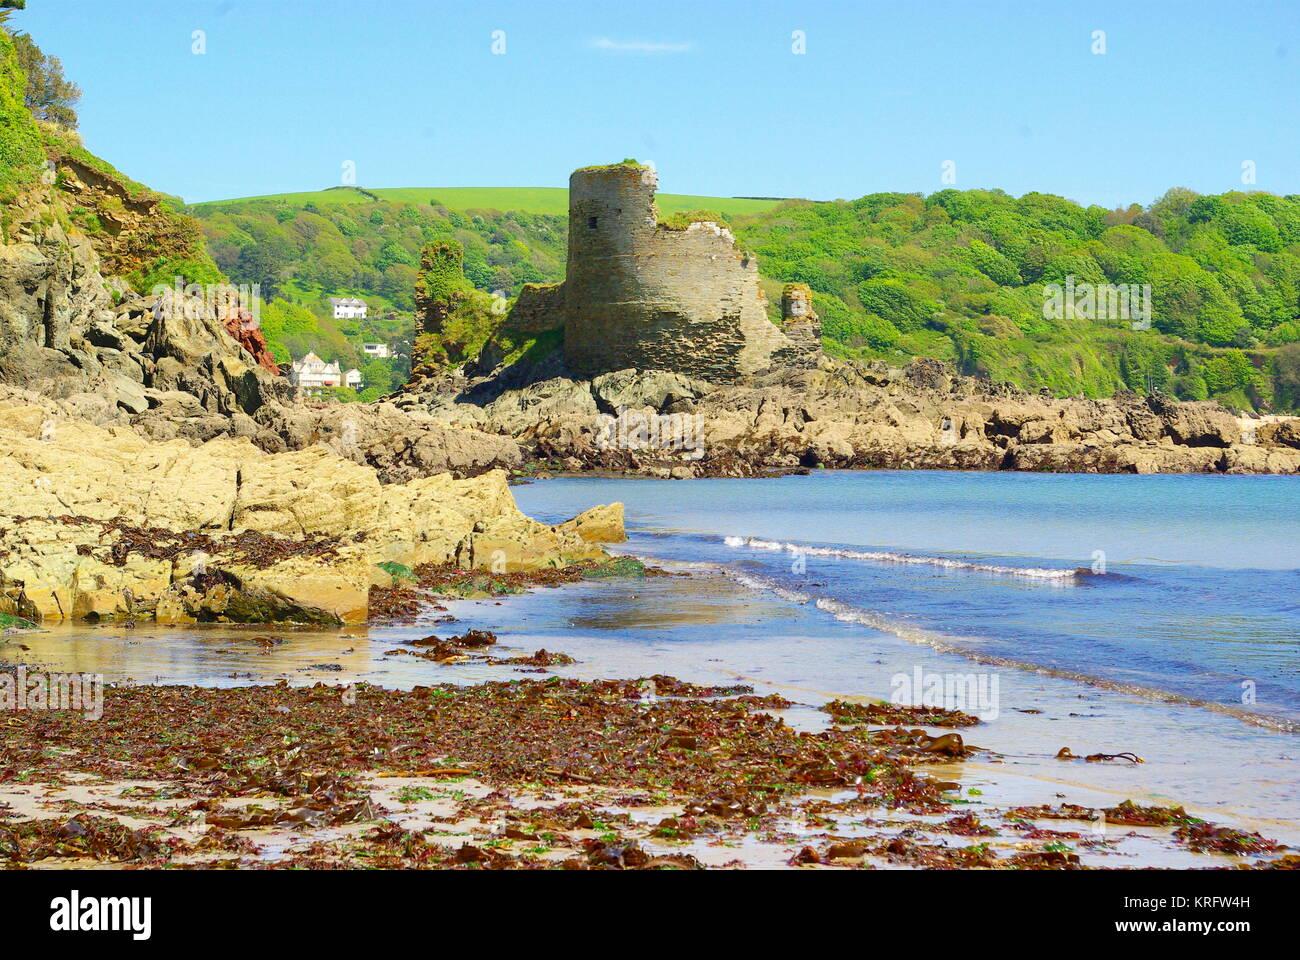 Salcombe castillo o fortaleza Charles, cerca del norte de Arenas, Salcombe, Devon. Fecha: 2014 Imagen De Stock